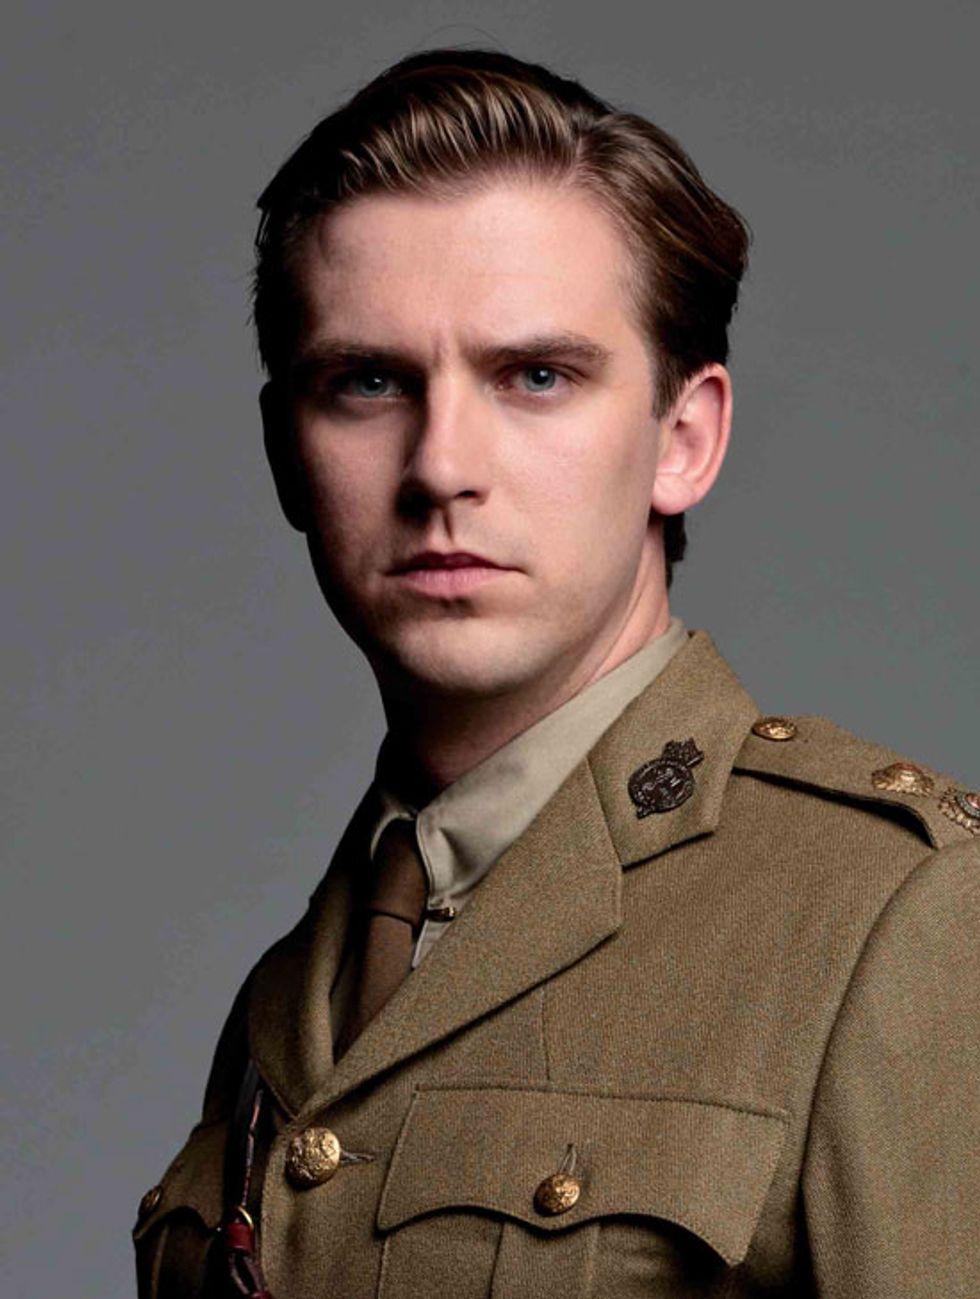 Downton Abbey Stars On-Screen Vs. Off-Screen